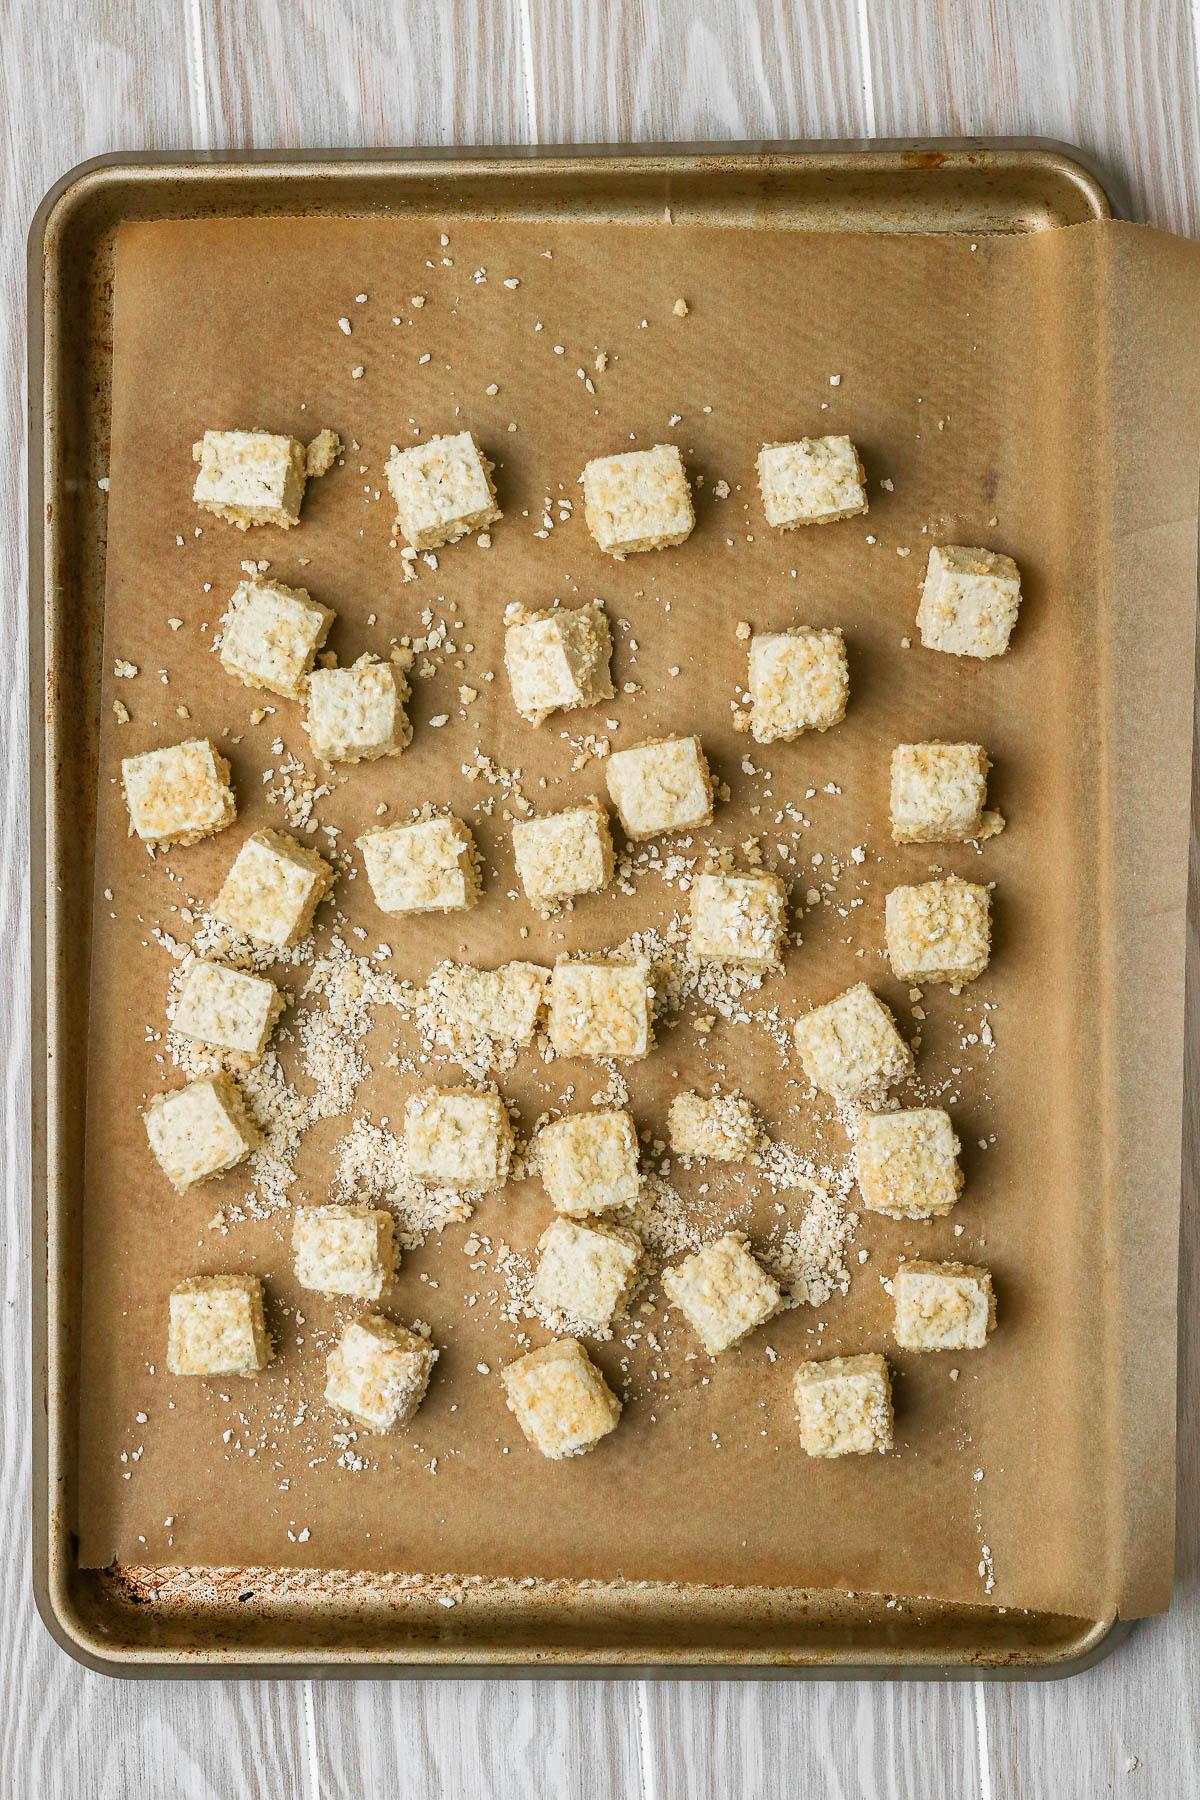 tofu pieces on a baking sheet before baking.